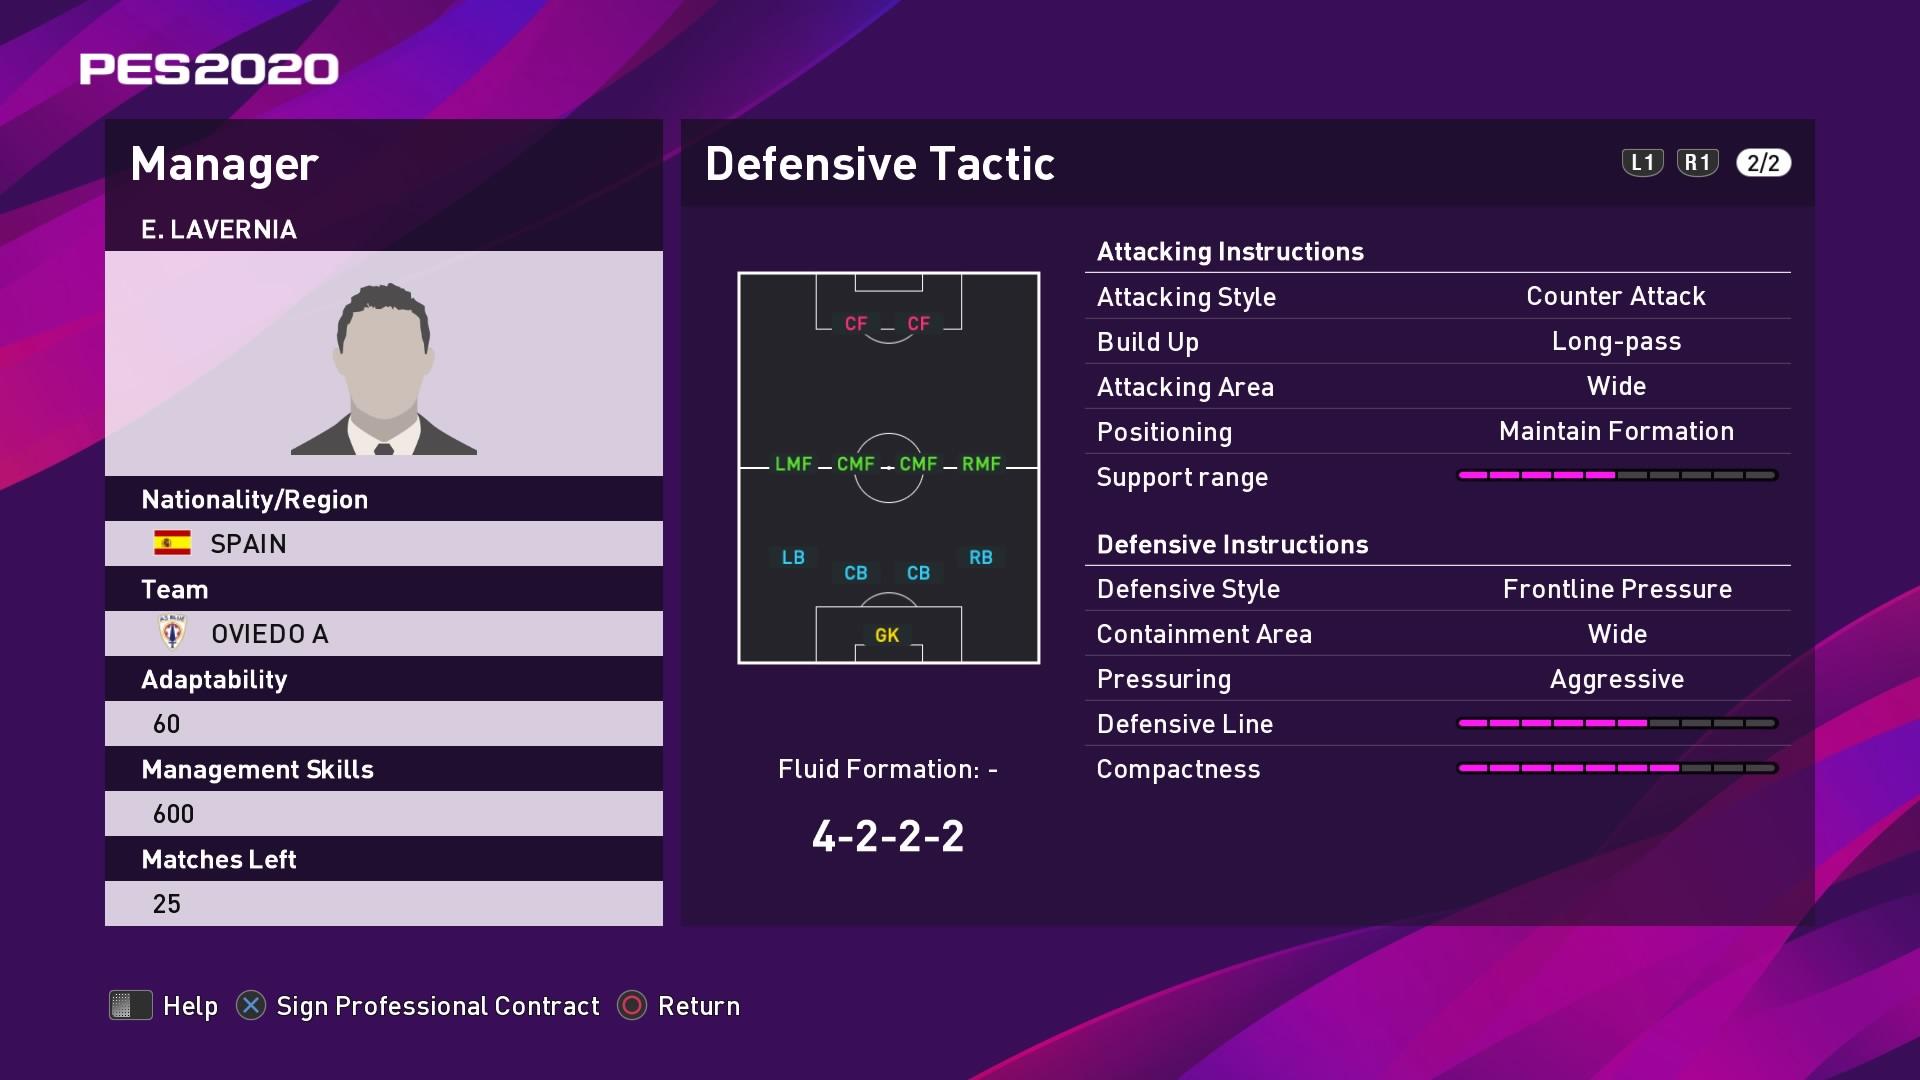 E. Lavernia (Javi Rozada) Defensive Tactic in PES 2020 myClub